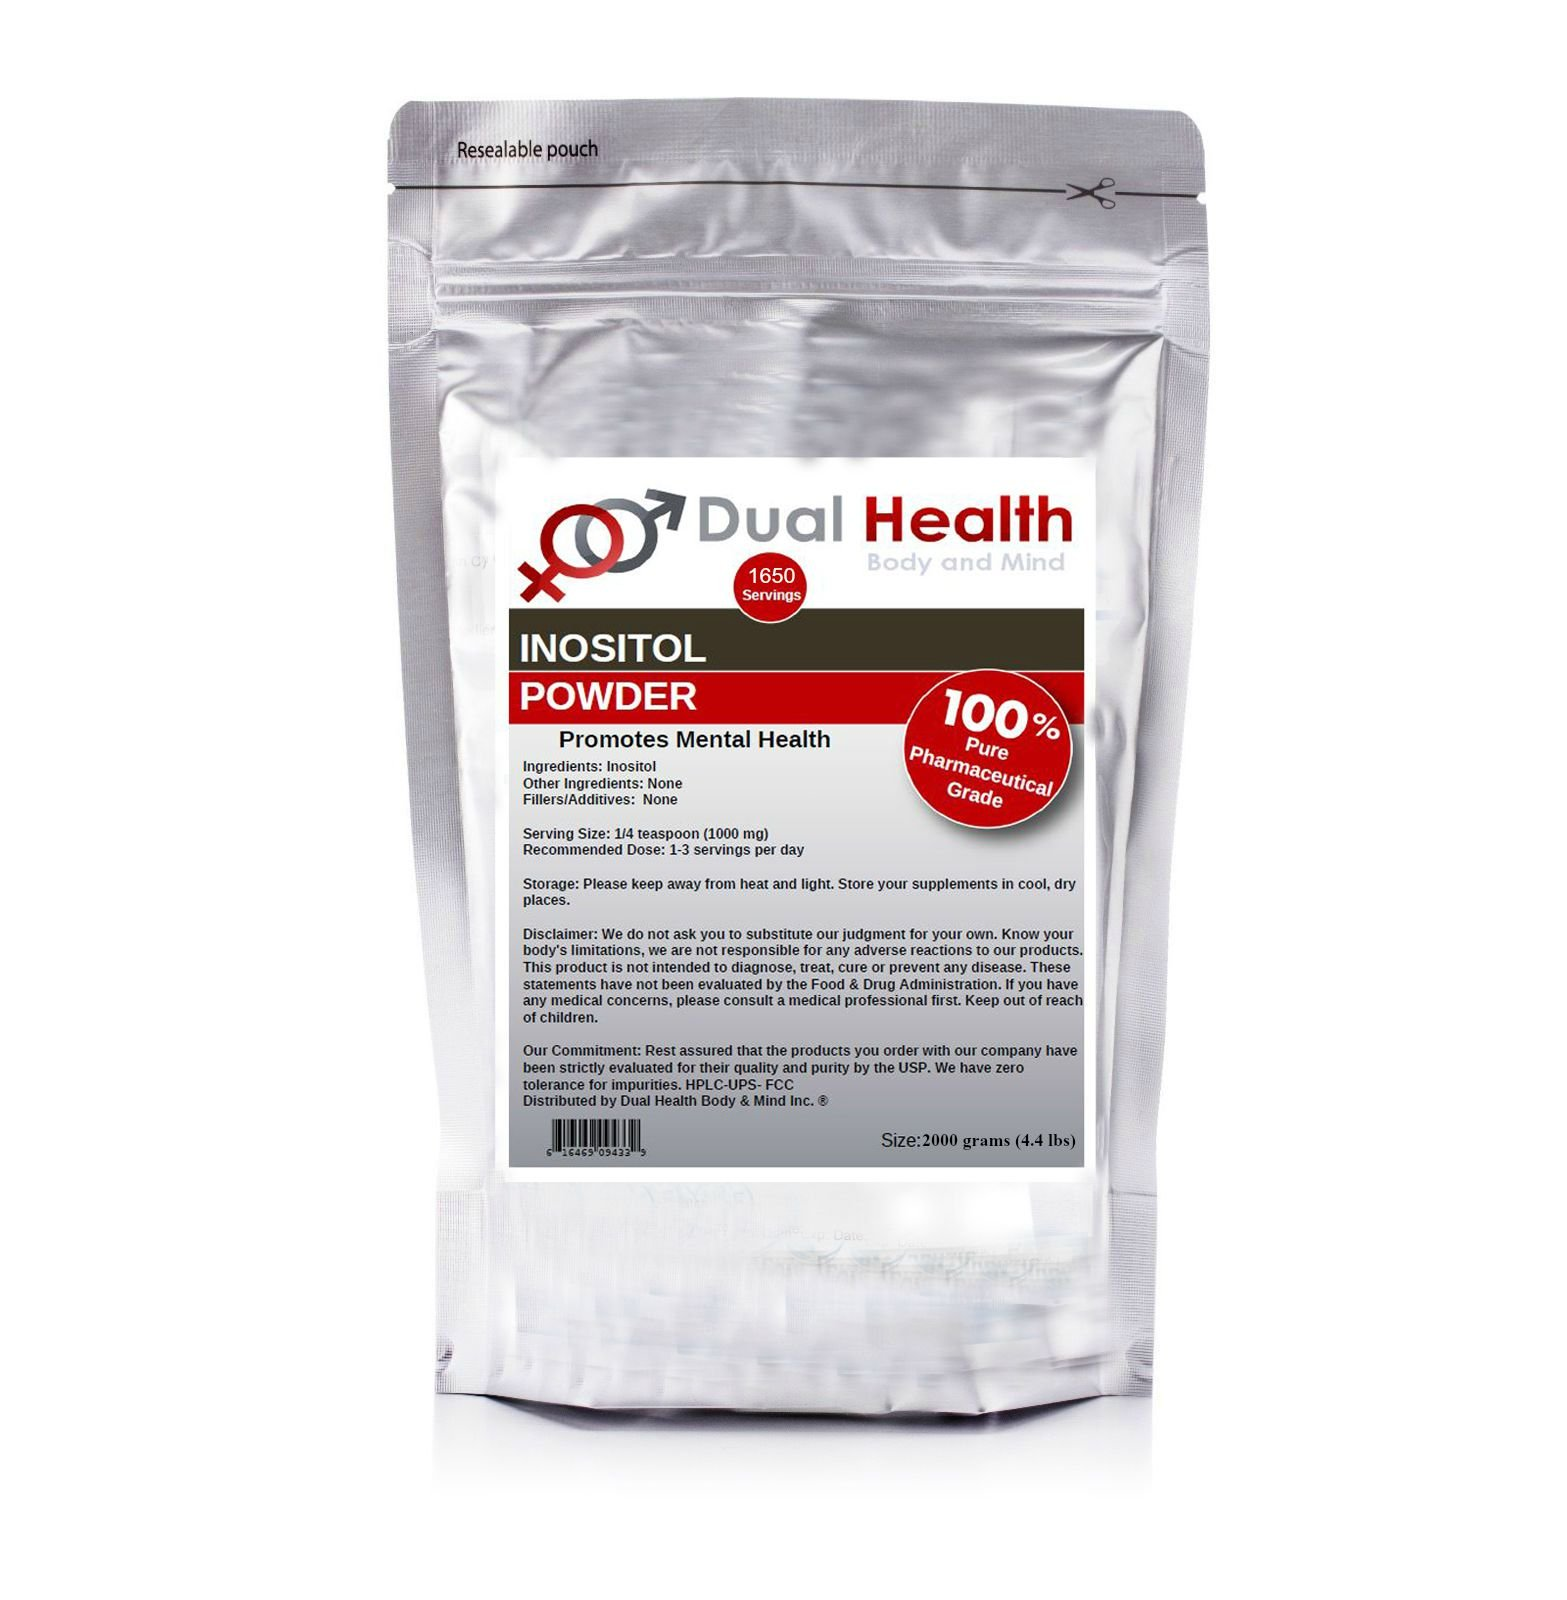 Pure Inositol Powder (2000 grams (4.4 lbs)) Bulk Supplements